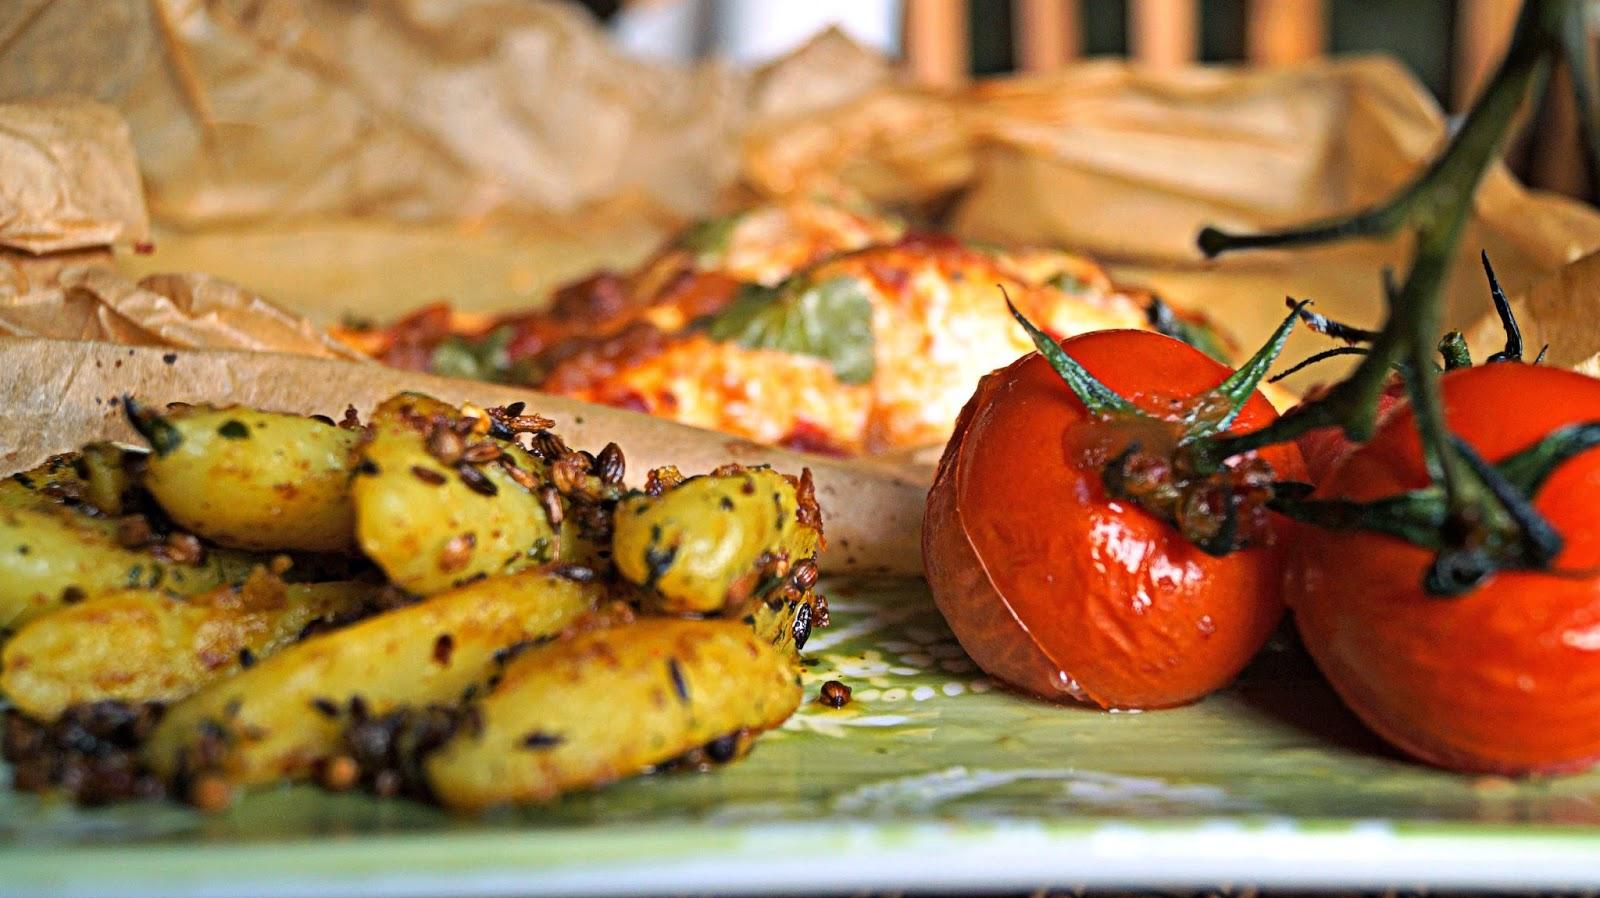 http://cupcakeluvs.blogspot.dk/2015/04/tomat-chutney-marineret-laks-tomato.html